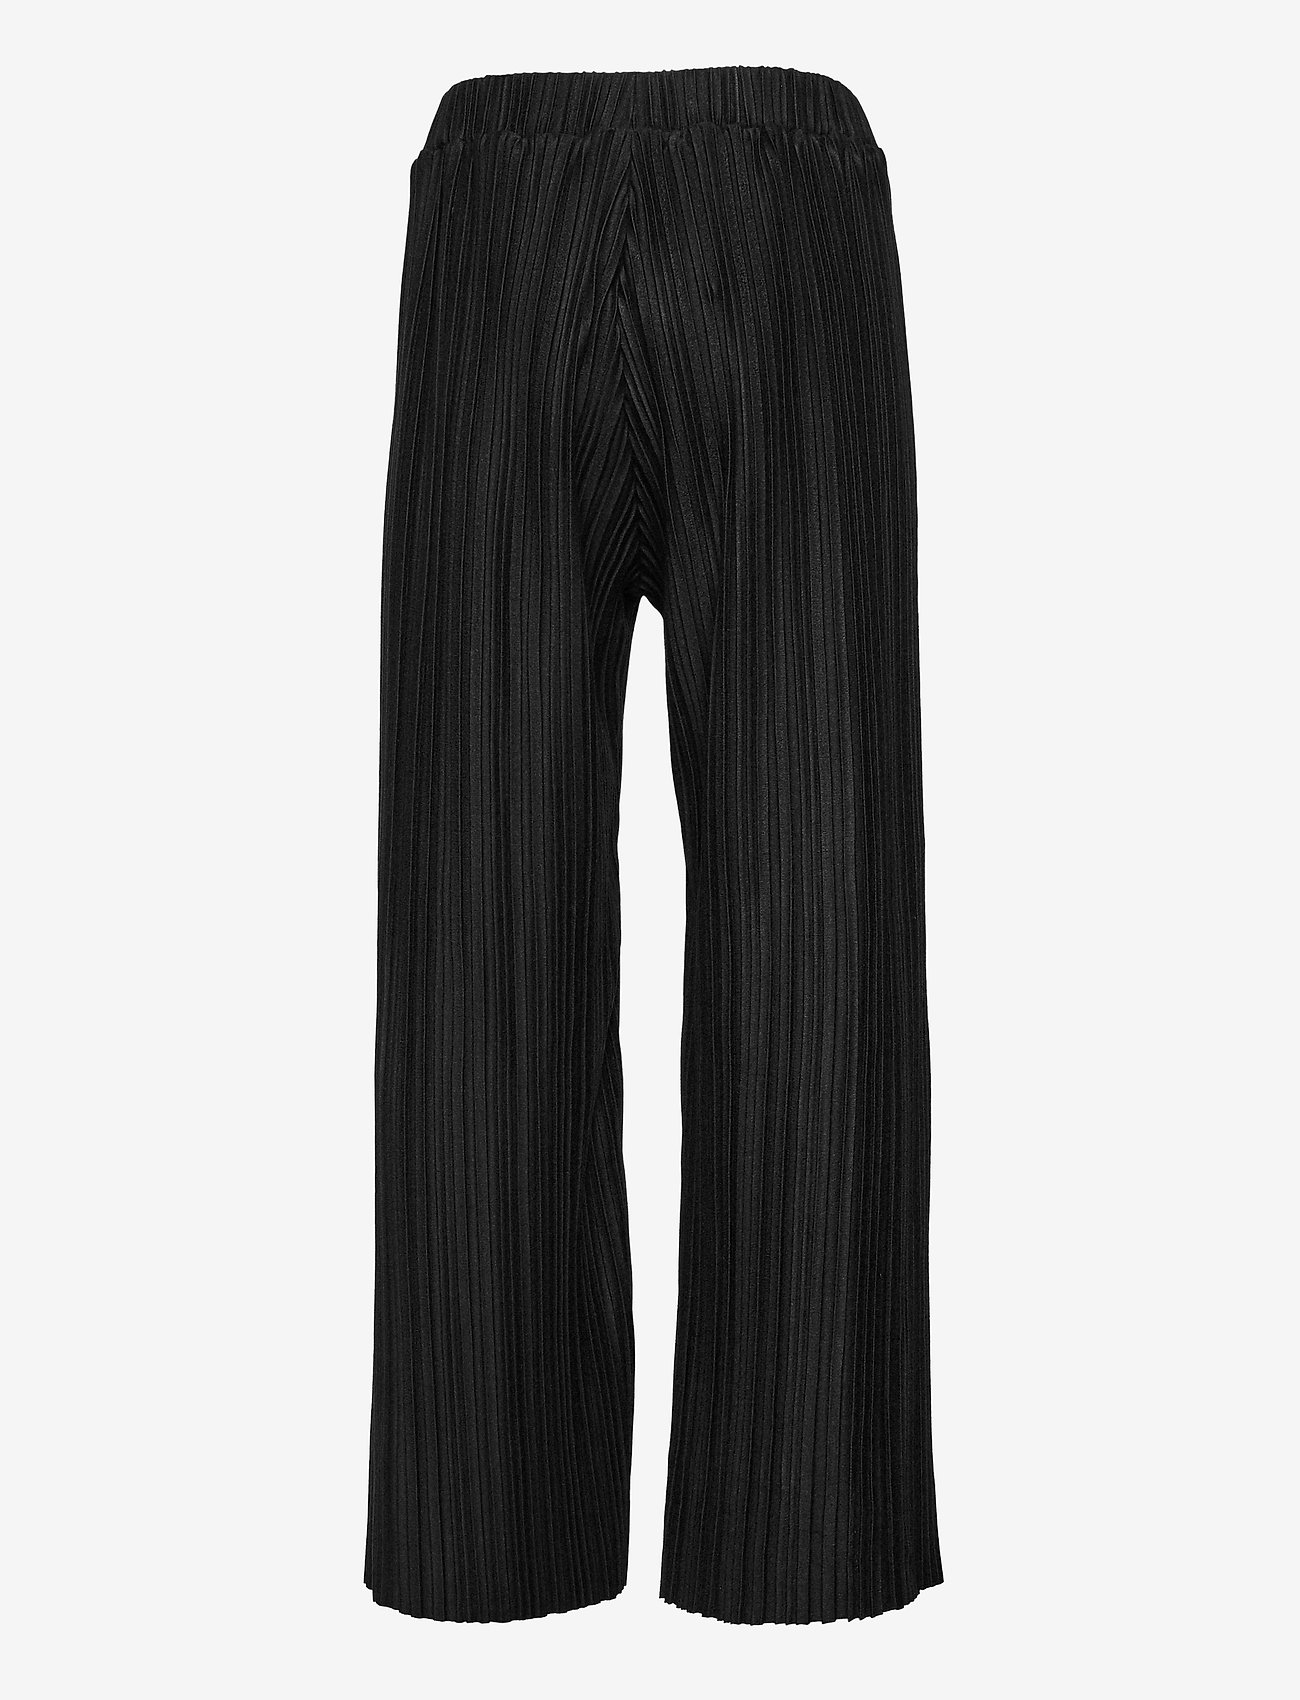 Lindex - Trousers Pamela plissee - trousers - black - 1